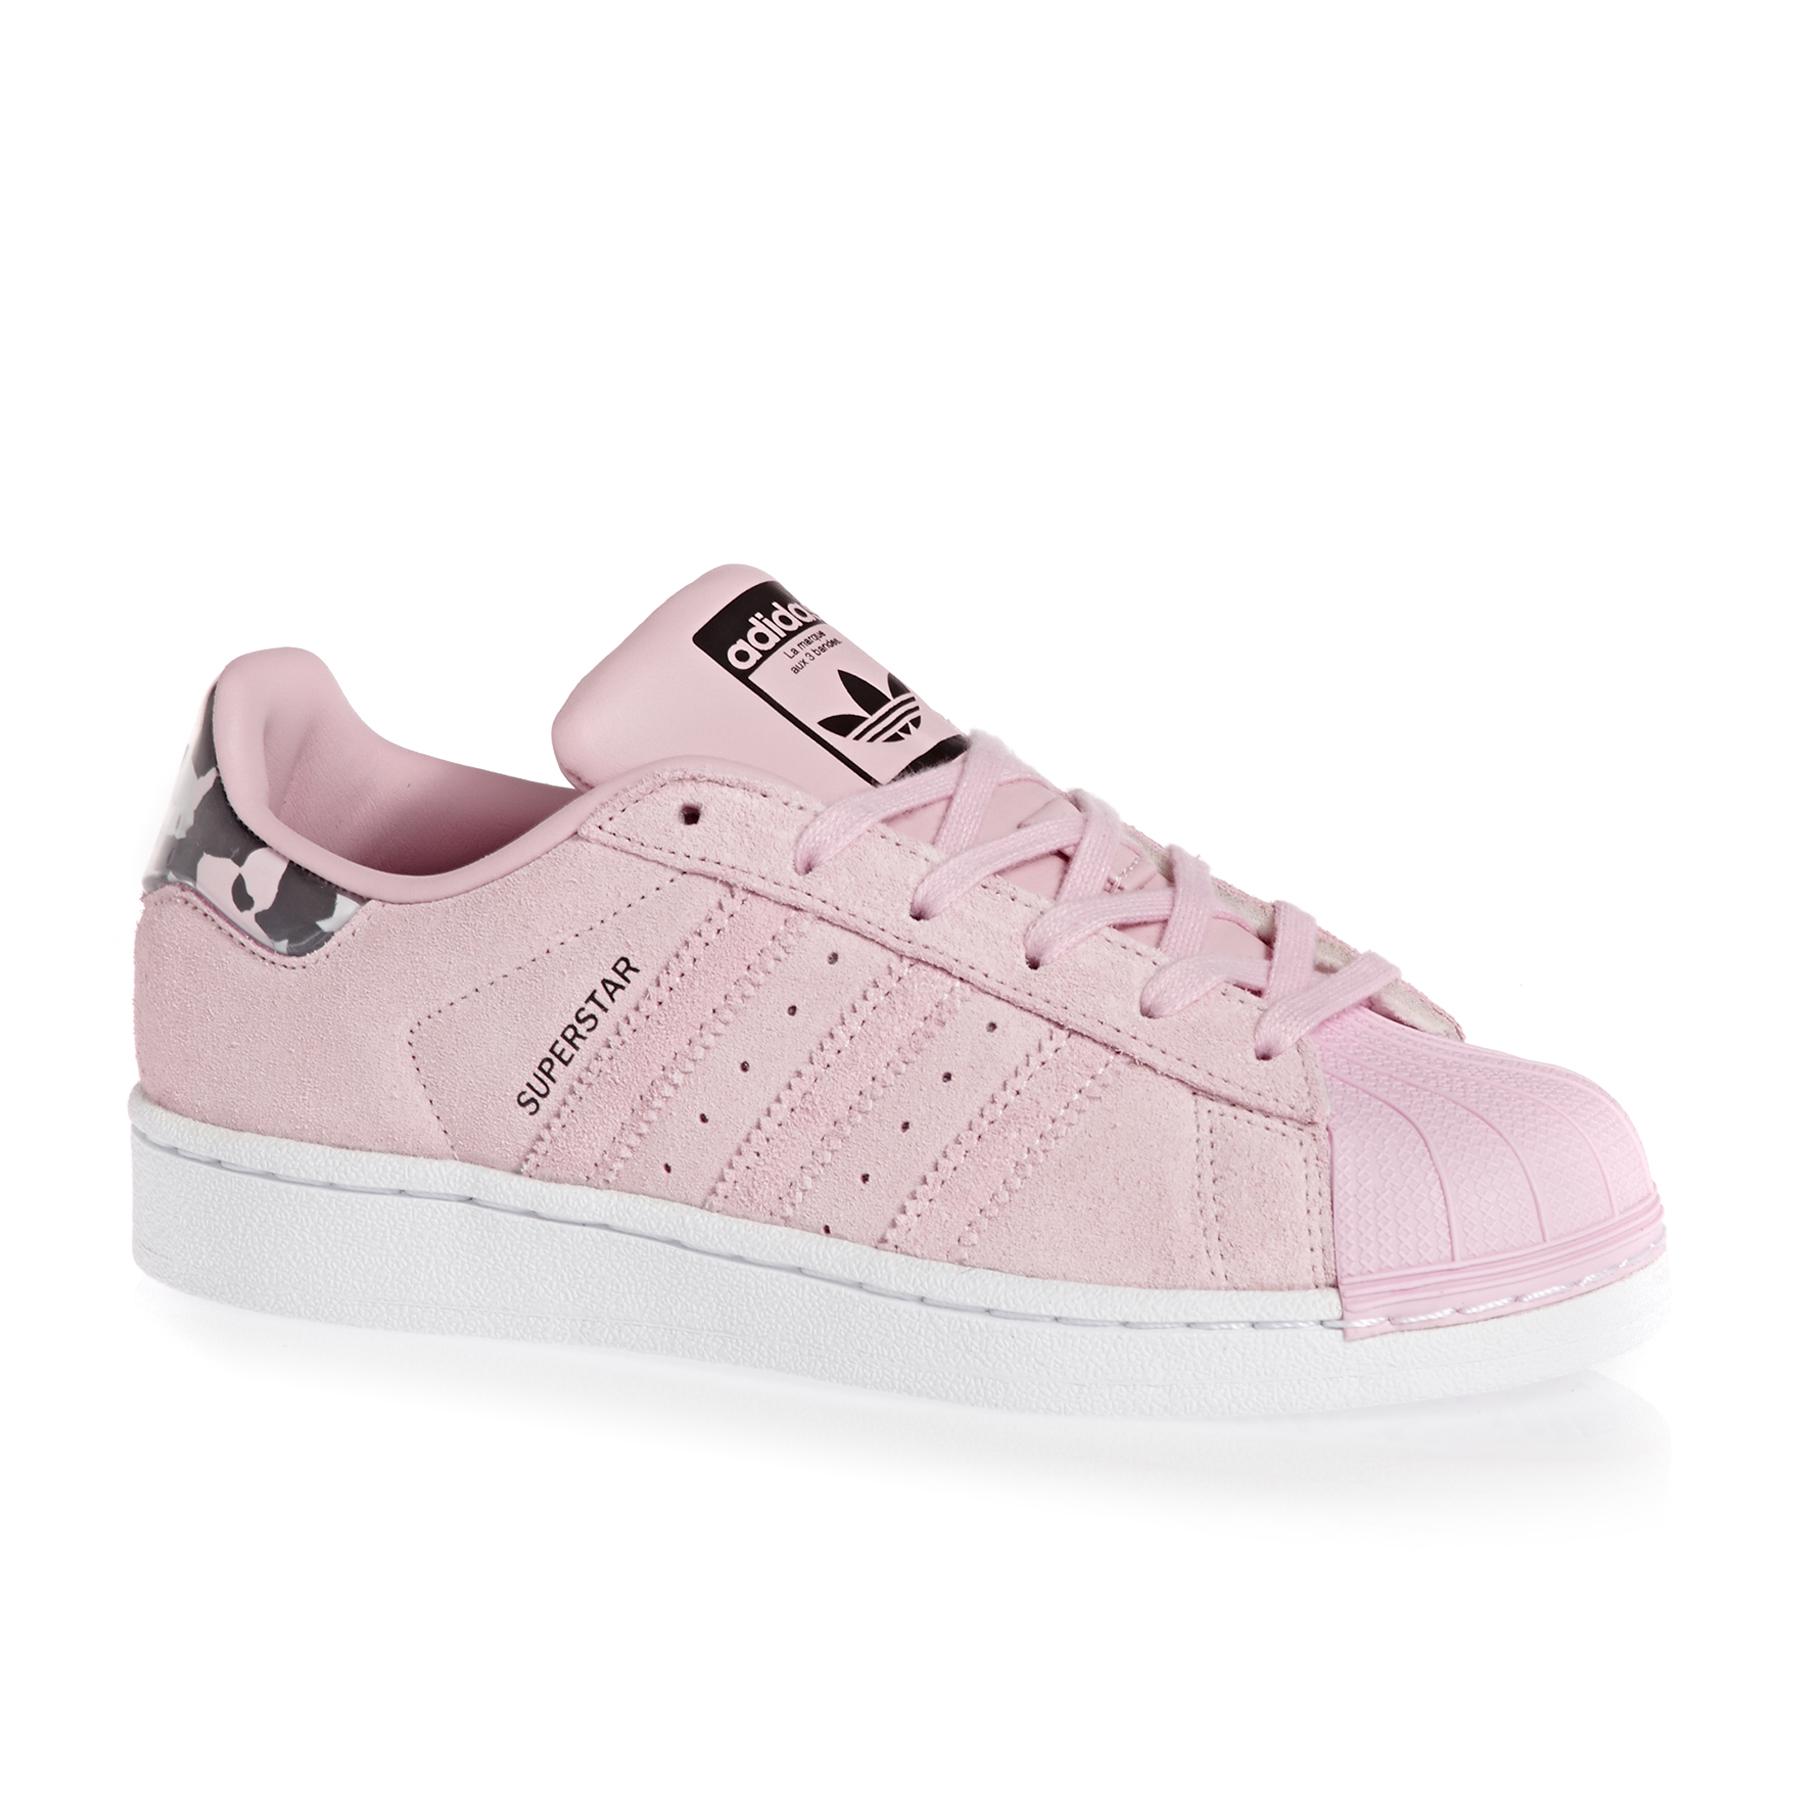 Adidas Originals Superstar Junior Kids Shoes Free Delivery